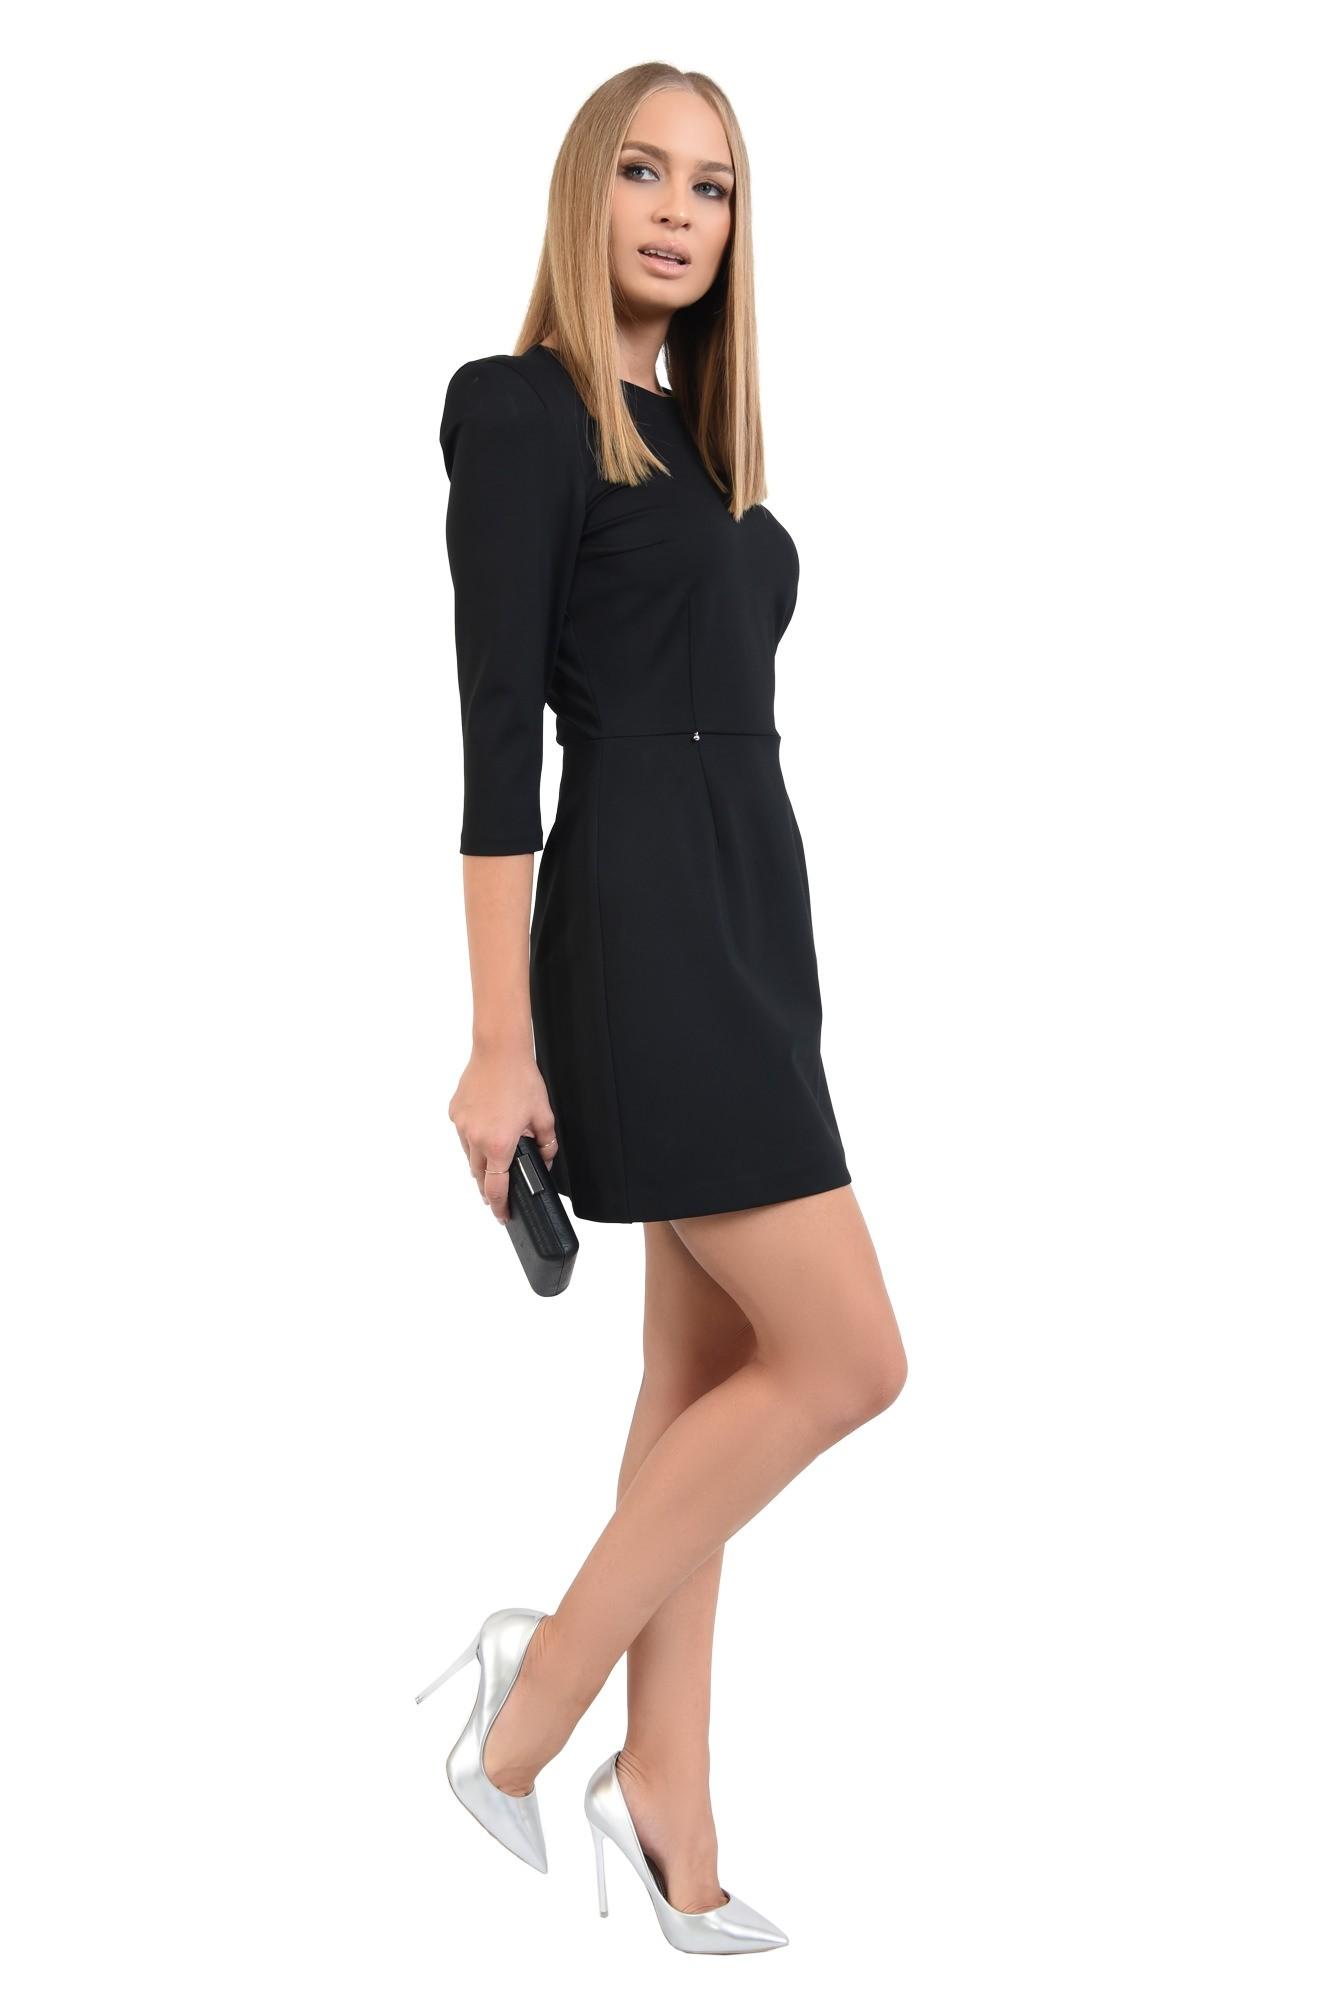 3 - 360 - rochie mini, neagra, maneci 3/4, croi usor evazat